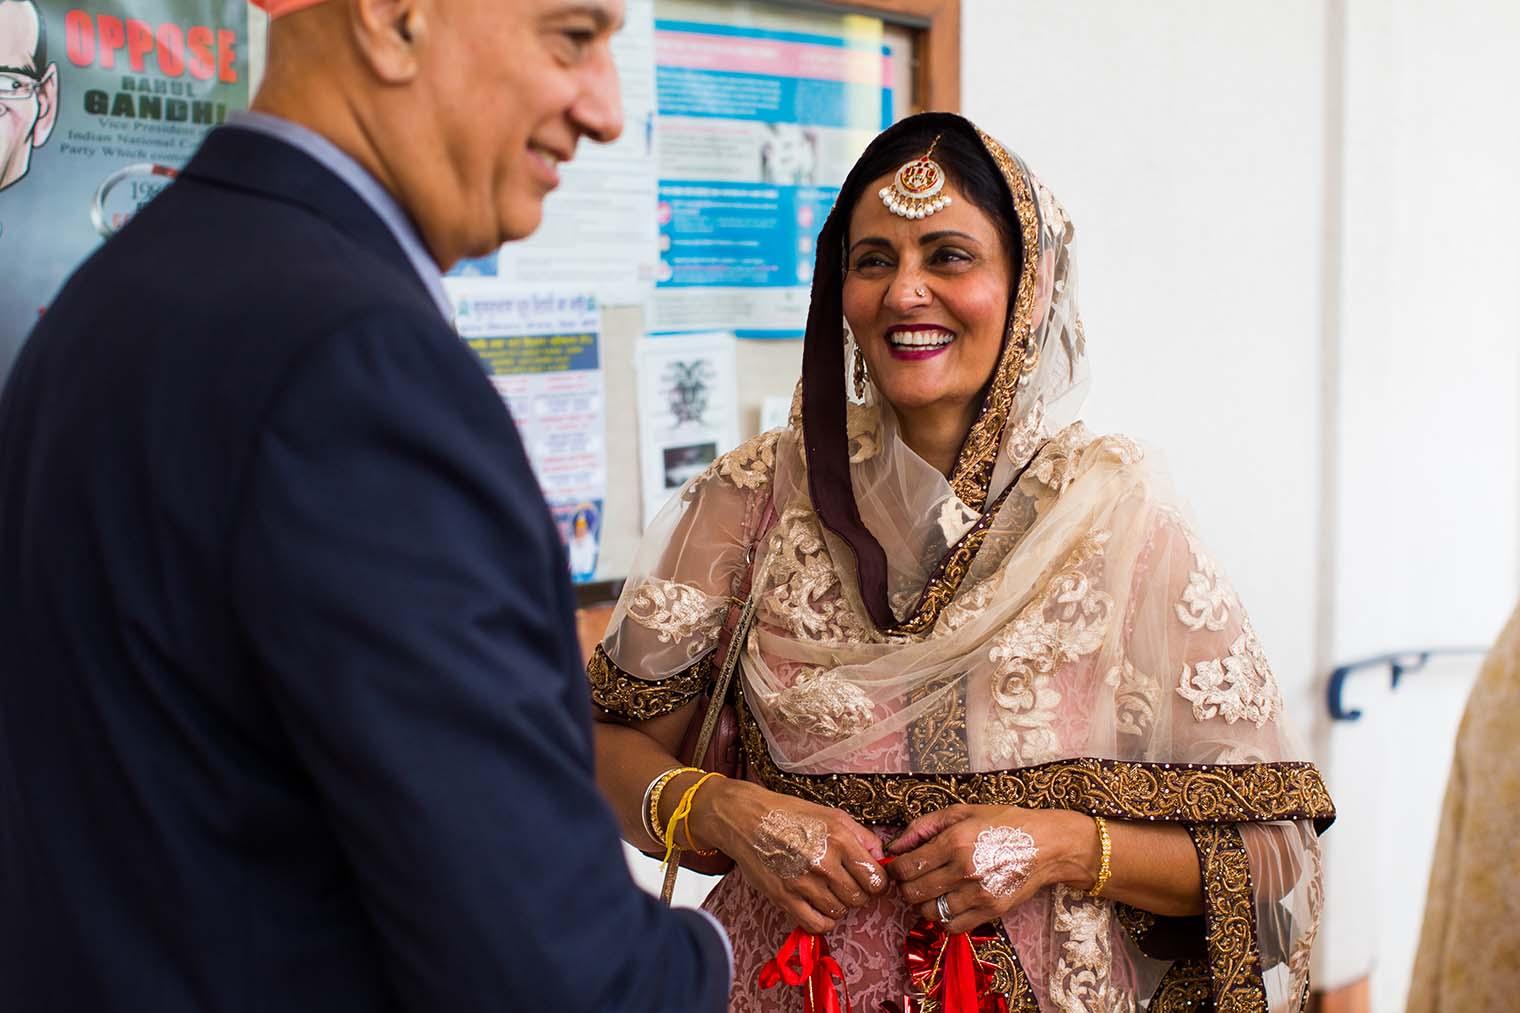 Gurdwara Sahib of Fremont Weddings